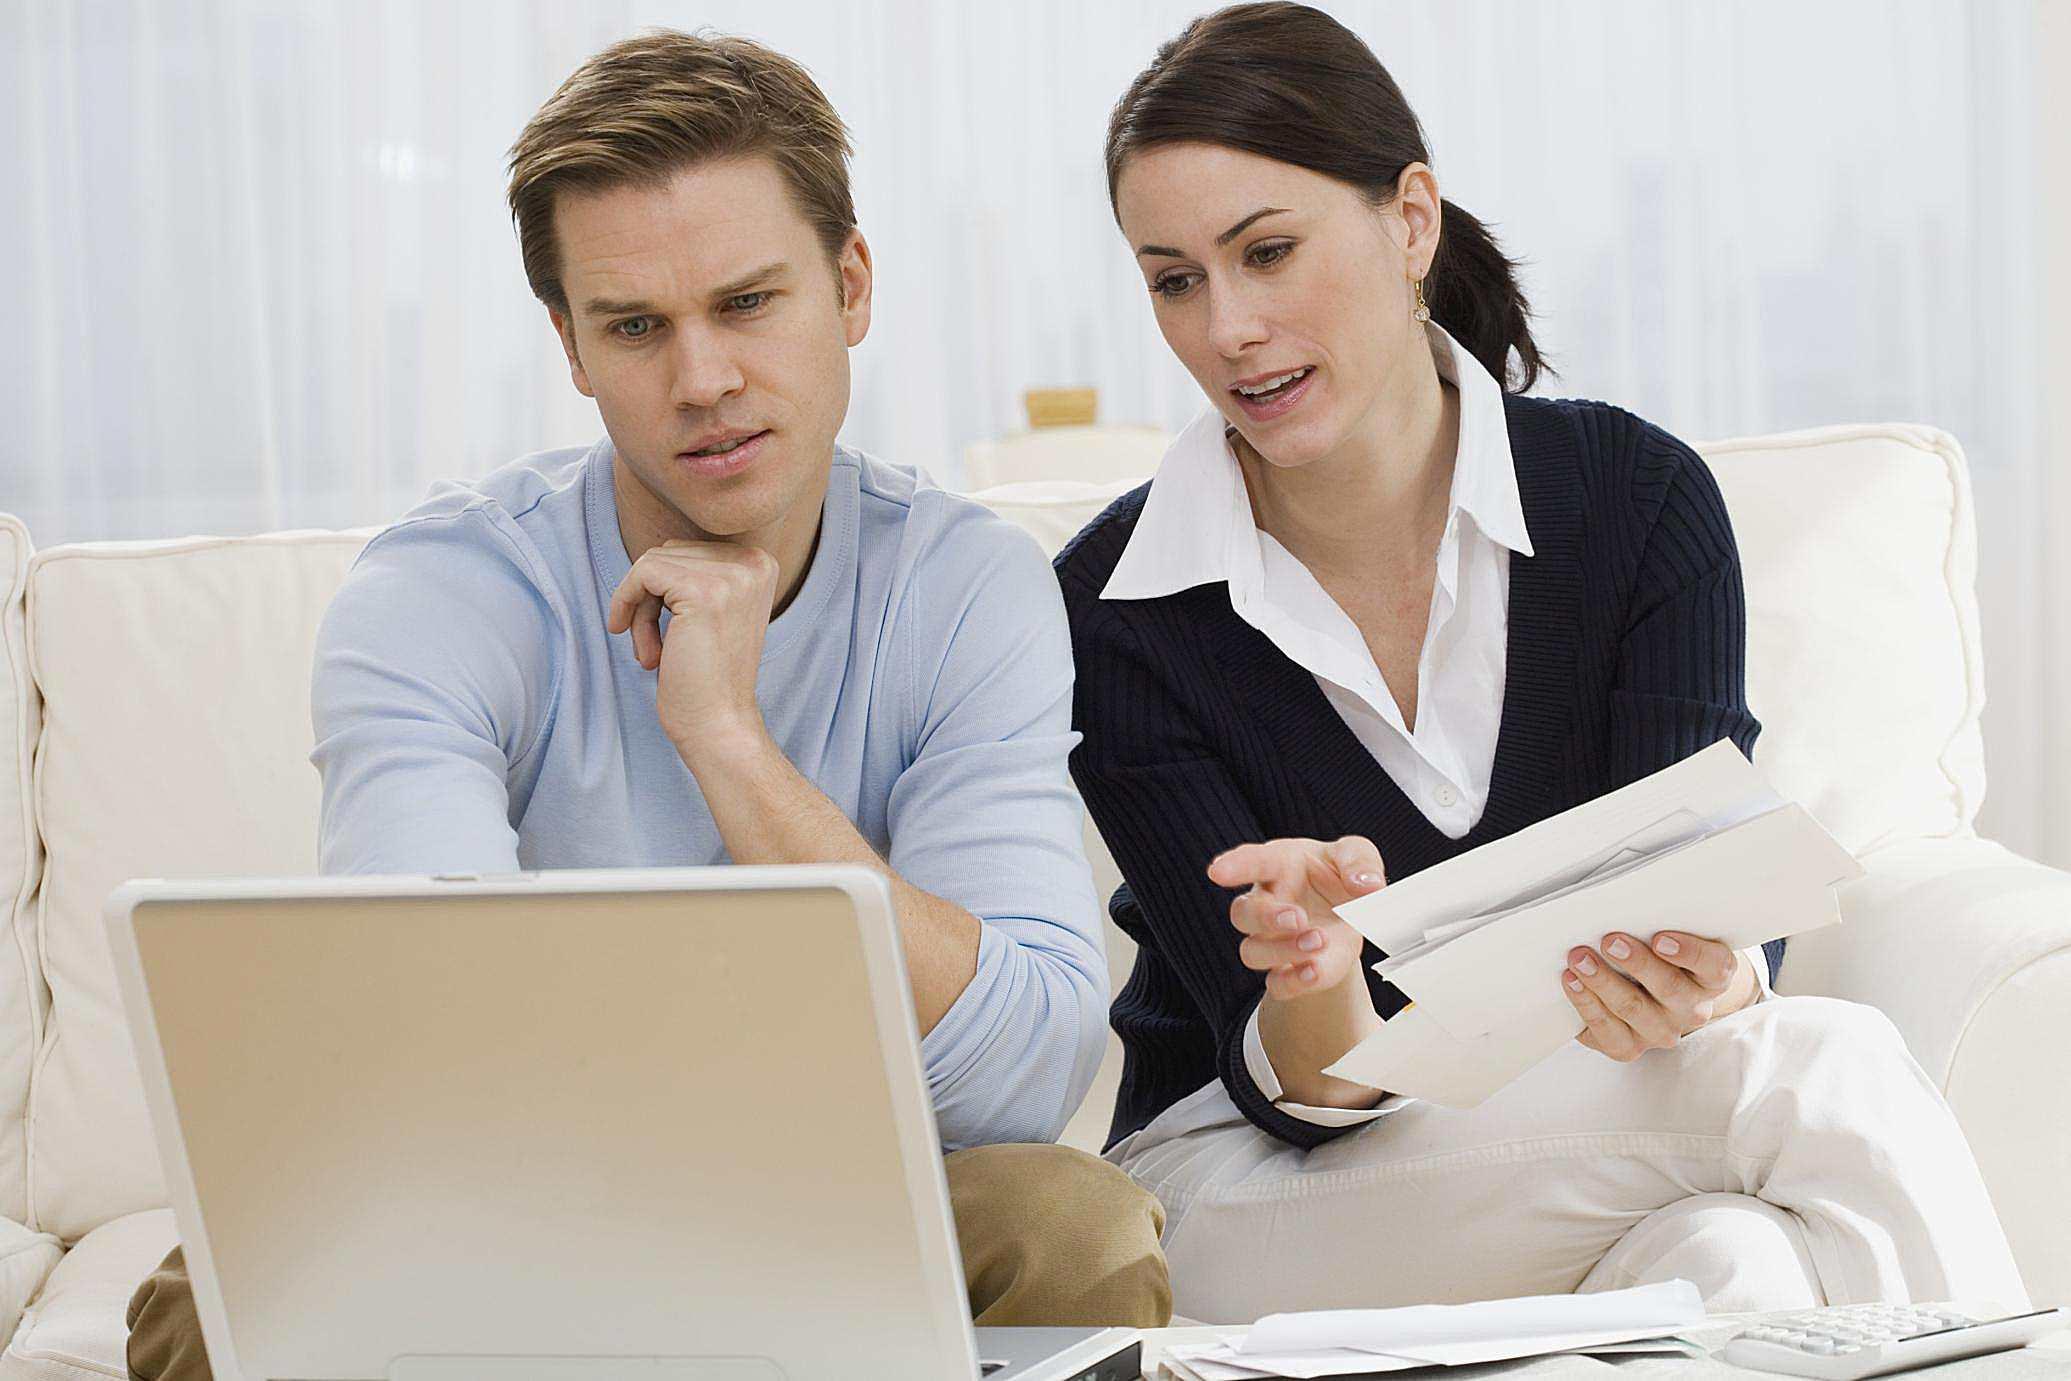 Couple paying bills on laptop